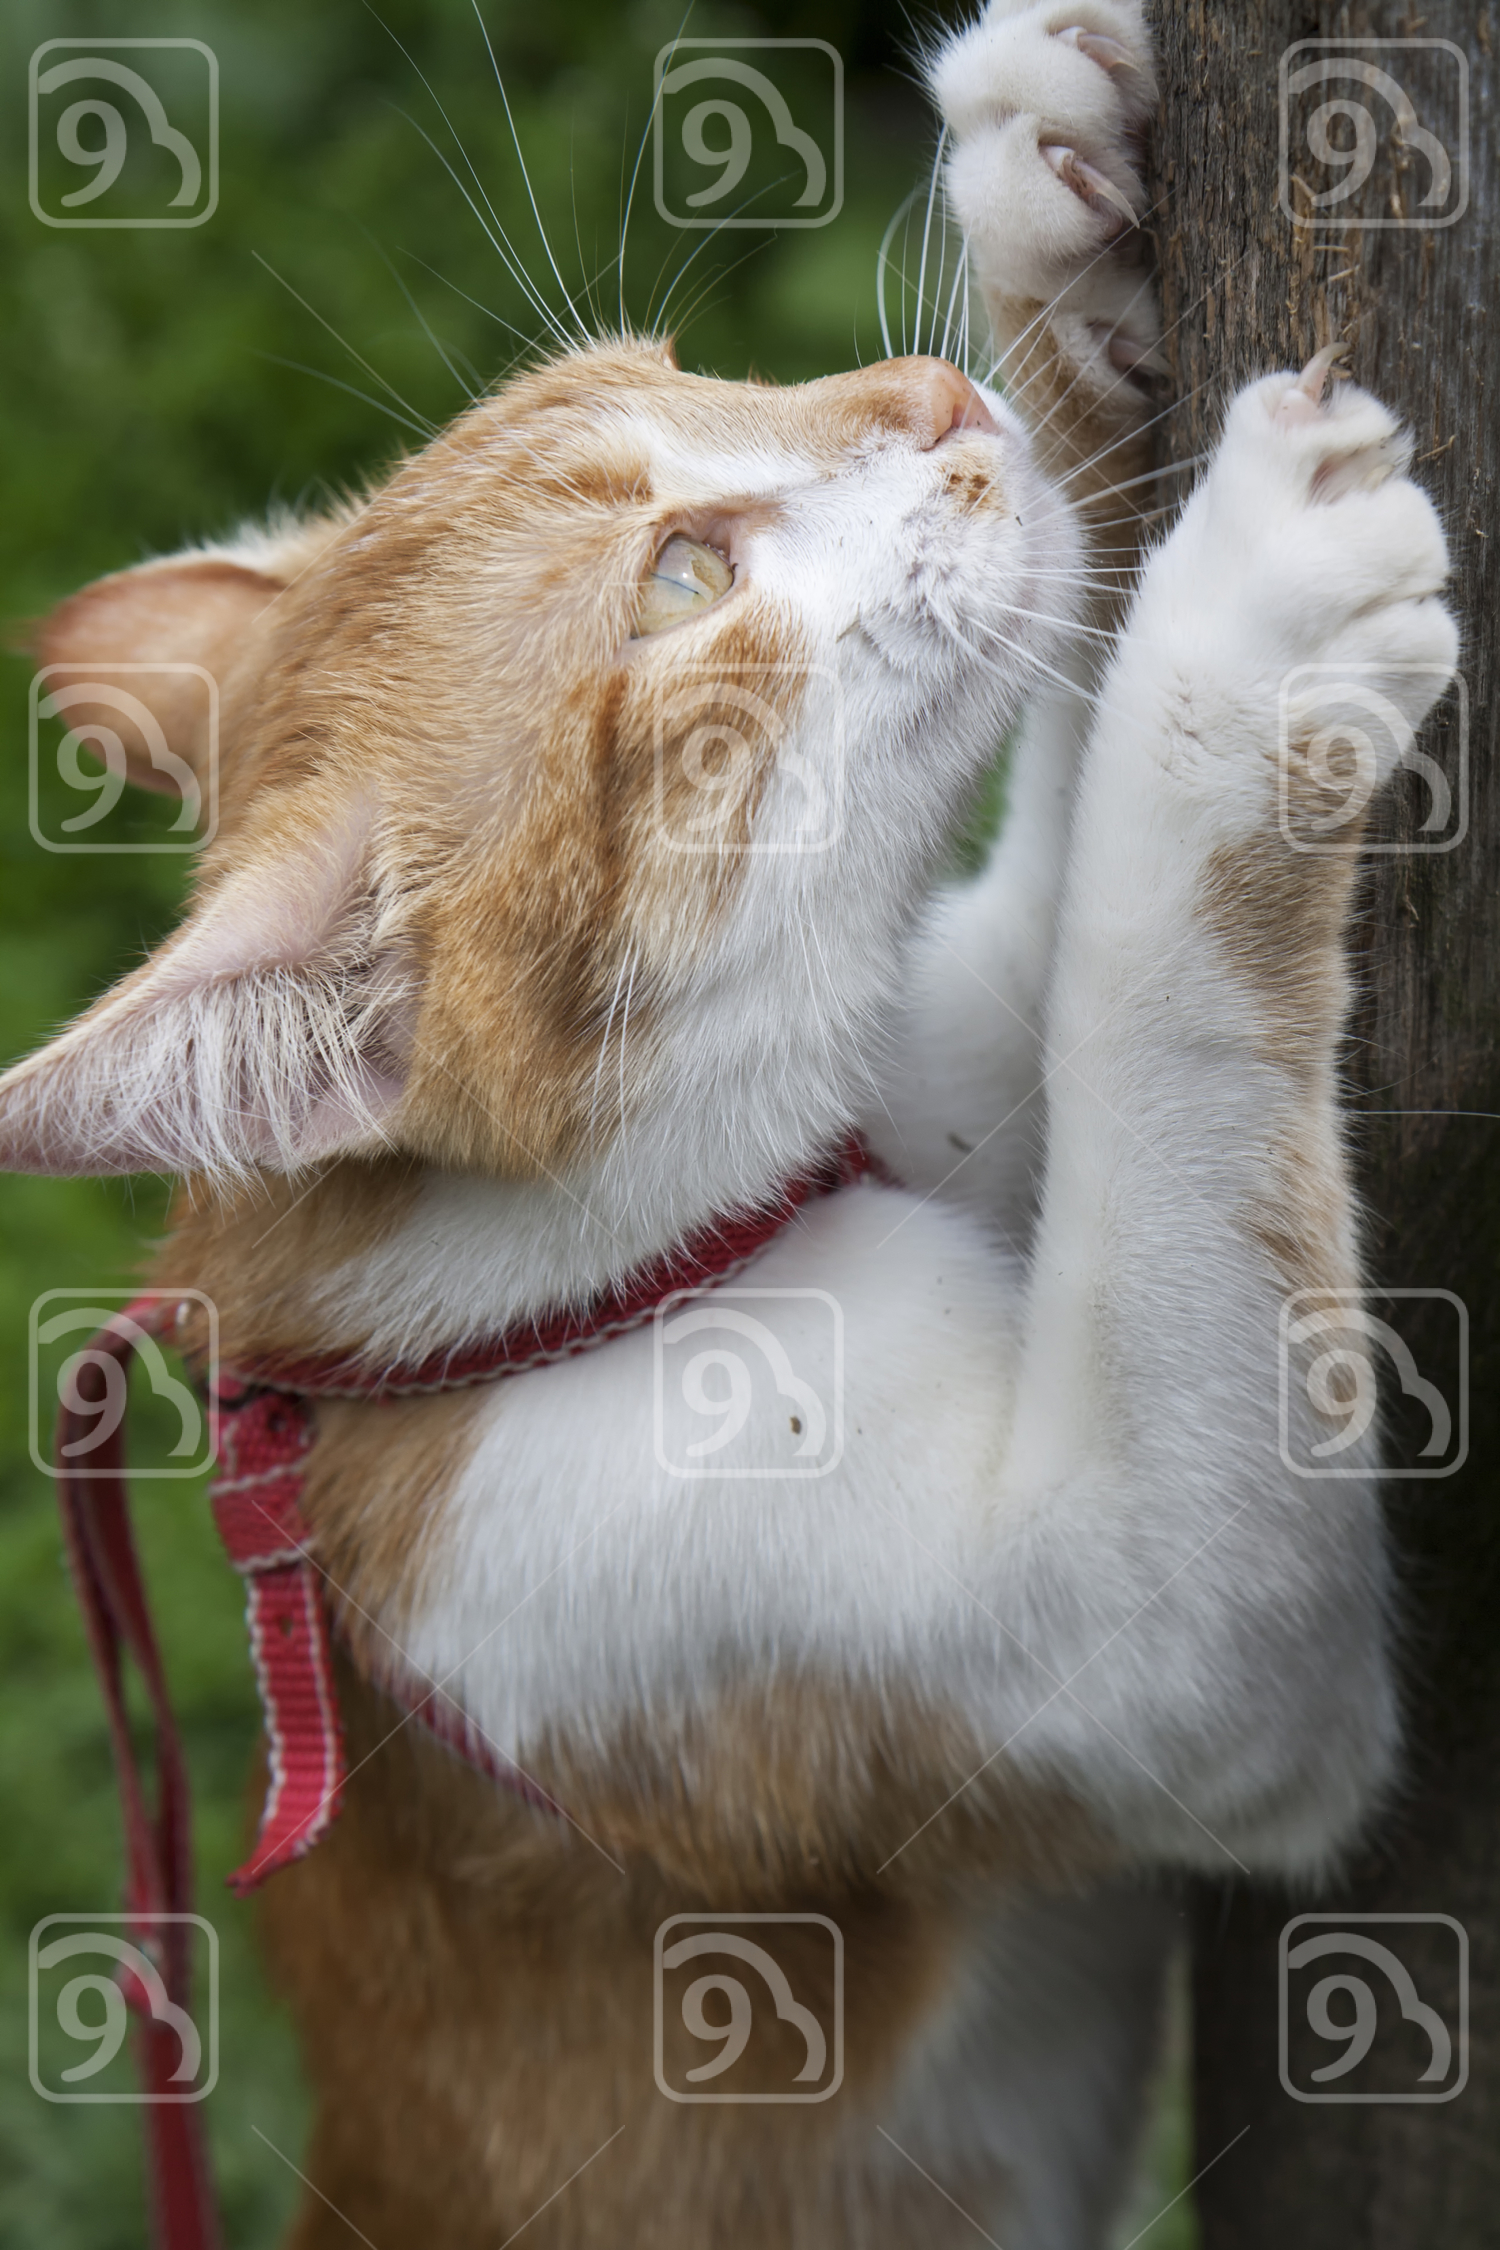 Cute white-red cat in red collar